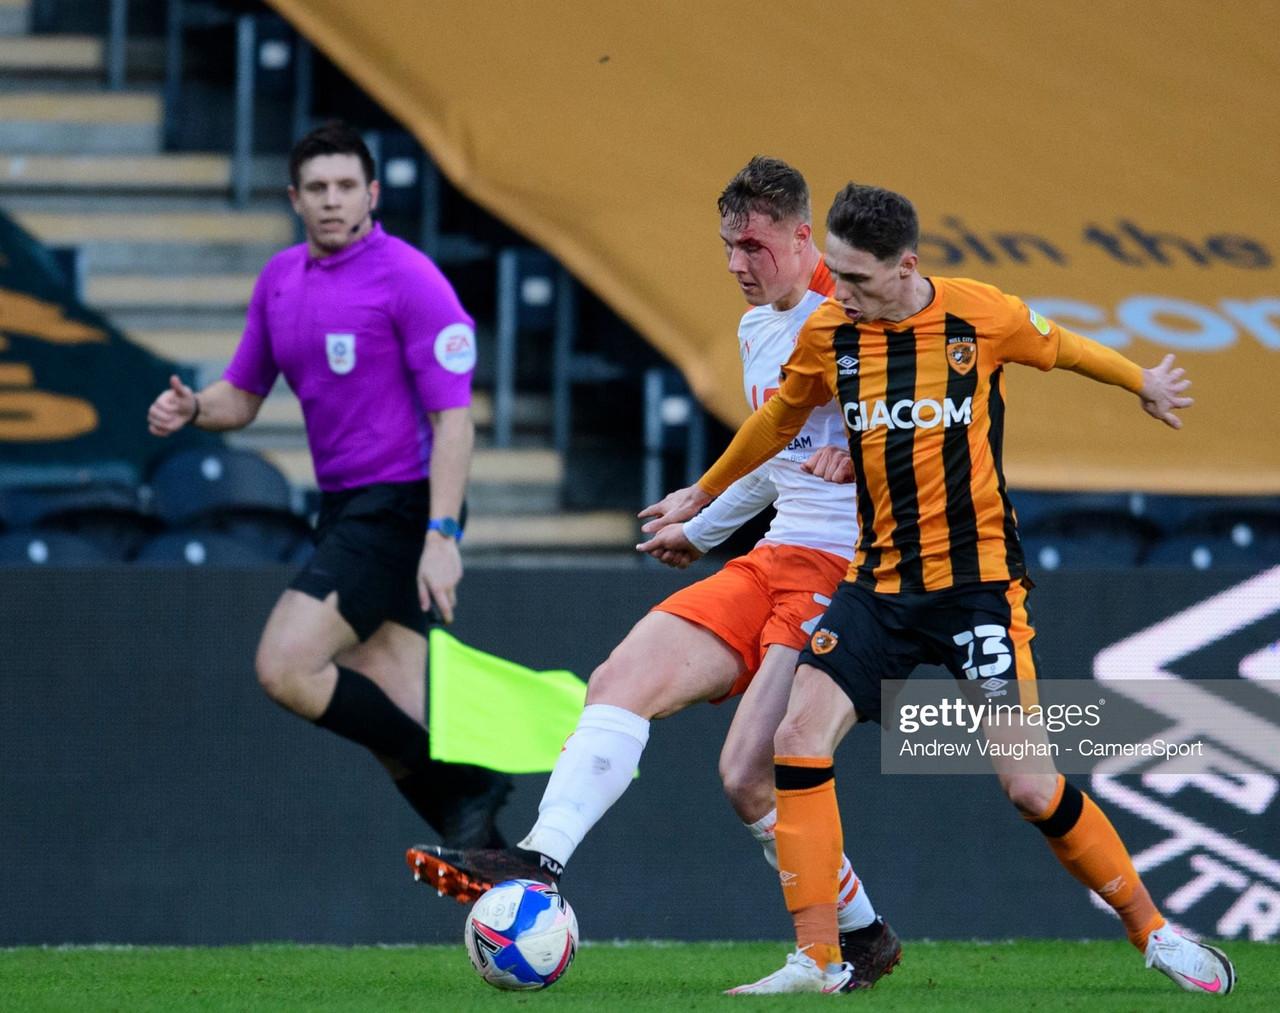 Hull City 1-1 Blackpool: Reece Burke sees red as Blackpool scrape a draw